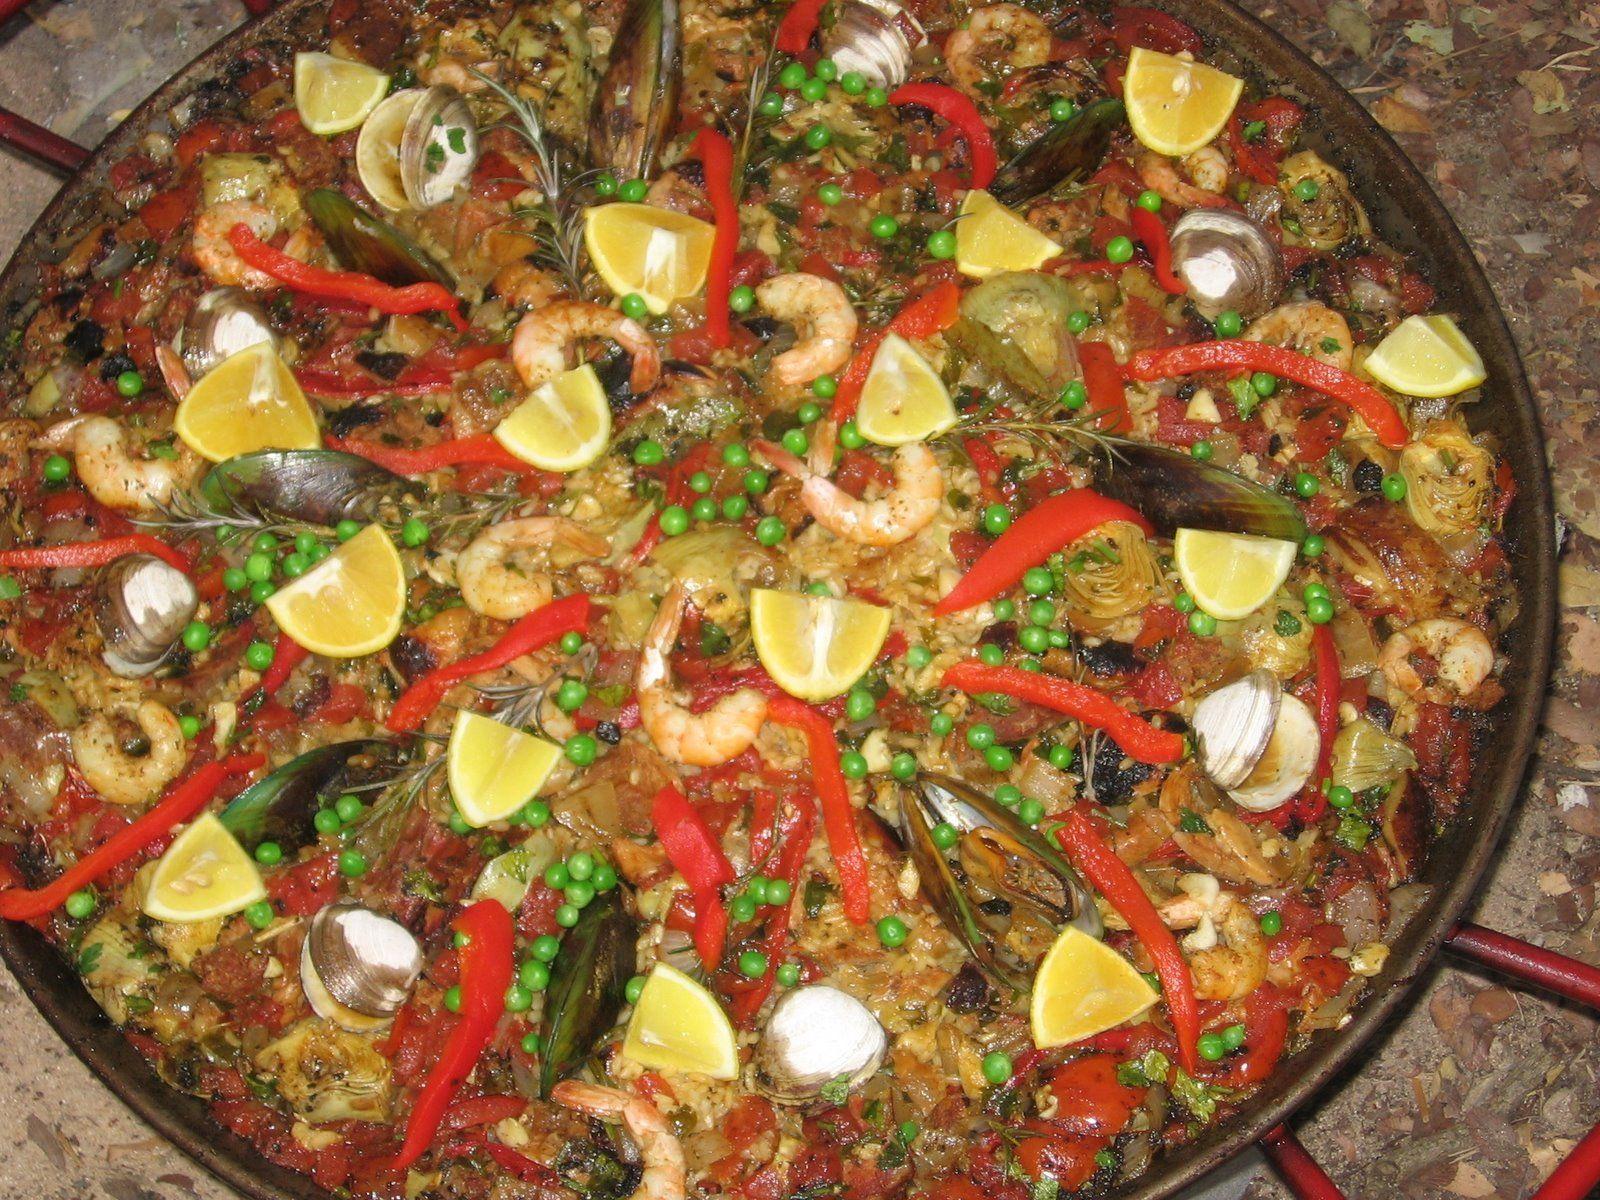 http://my.firedoglake.com/ruthcalvo/files/2011/02/seafood_paella_full.jpg